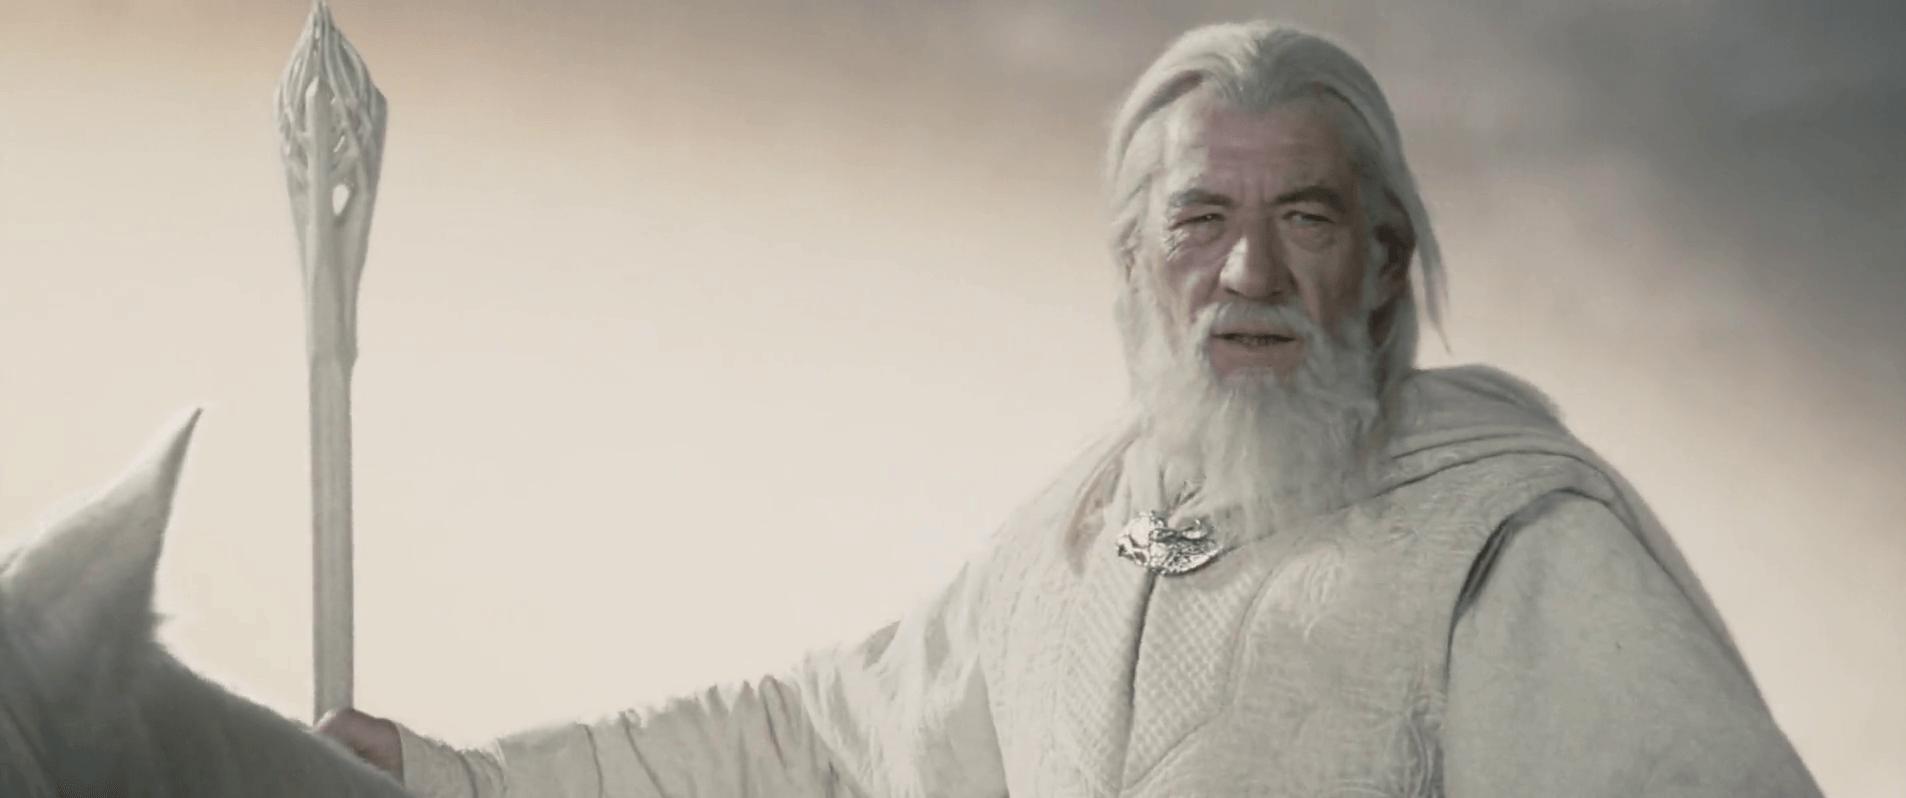 Battle Royale: Gandalf vs. Dumbledore